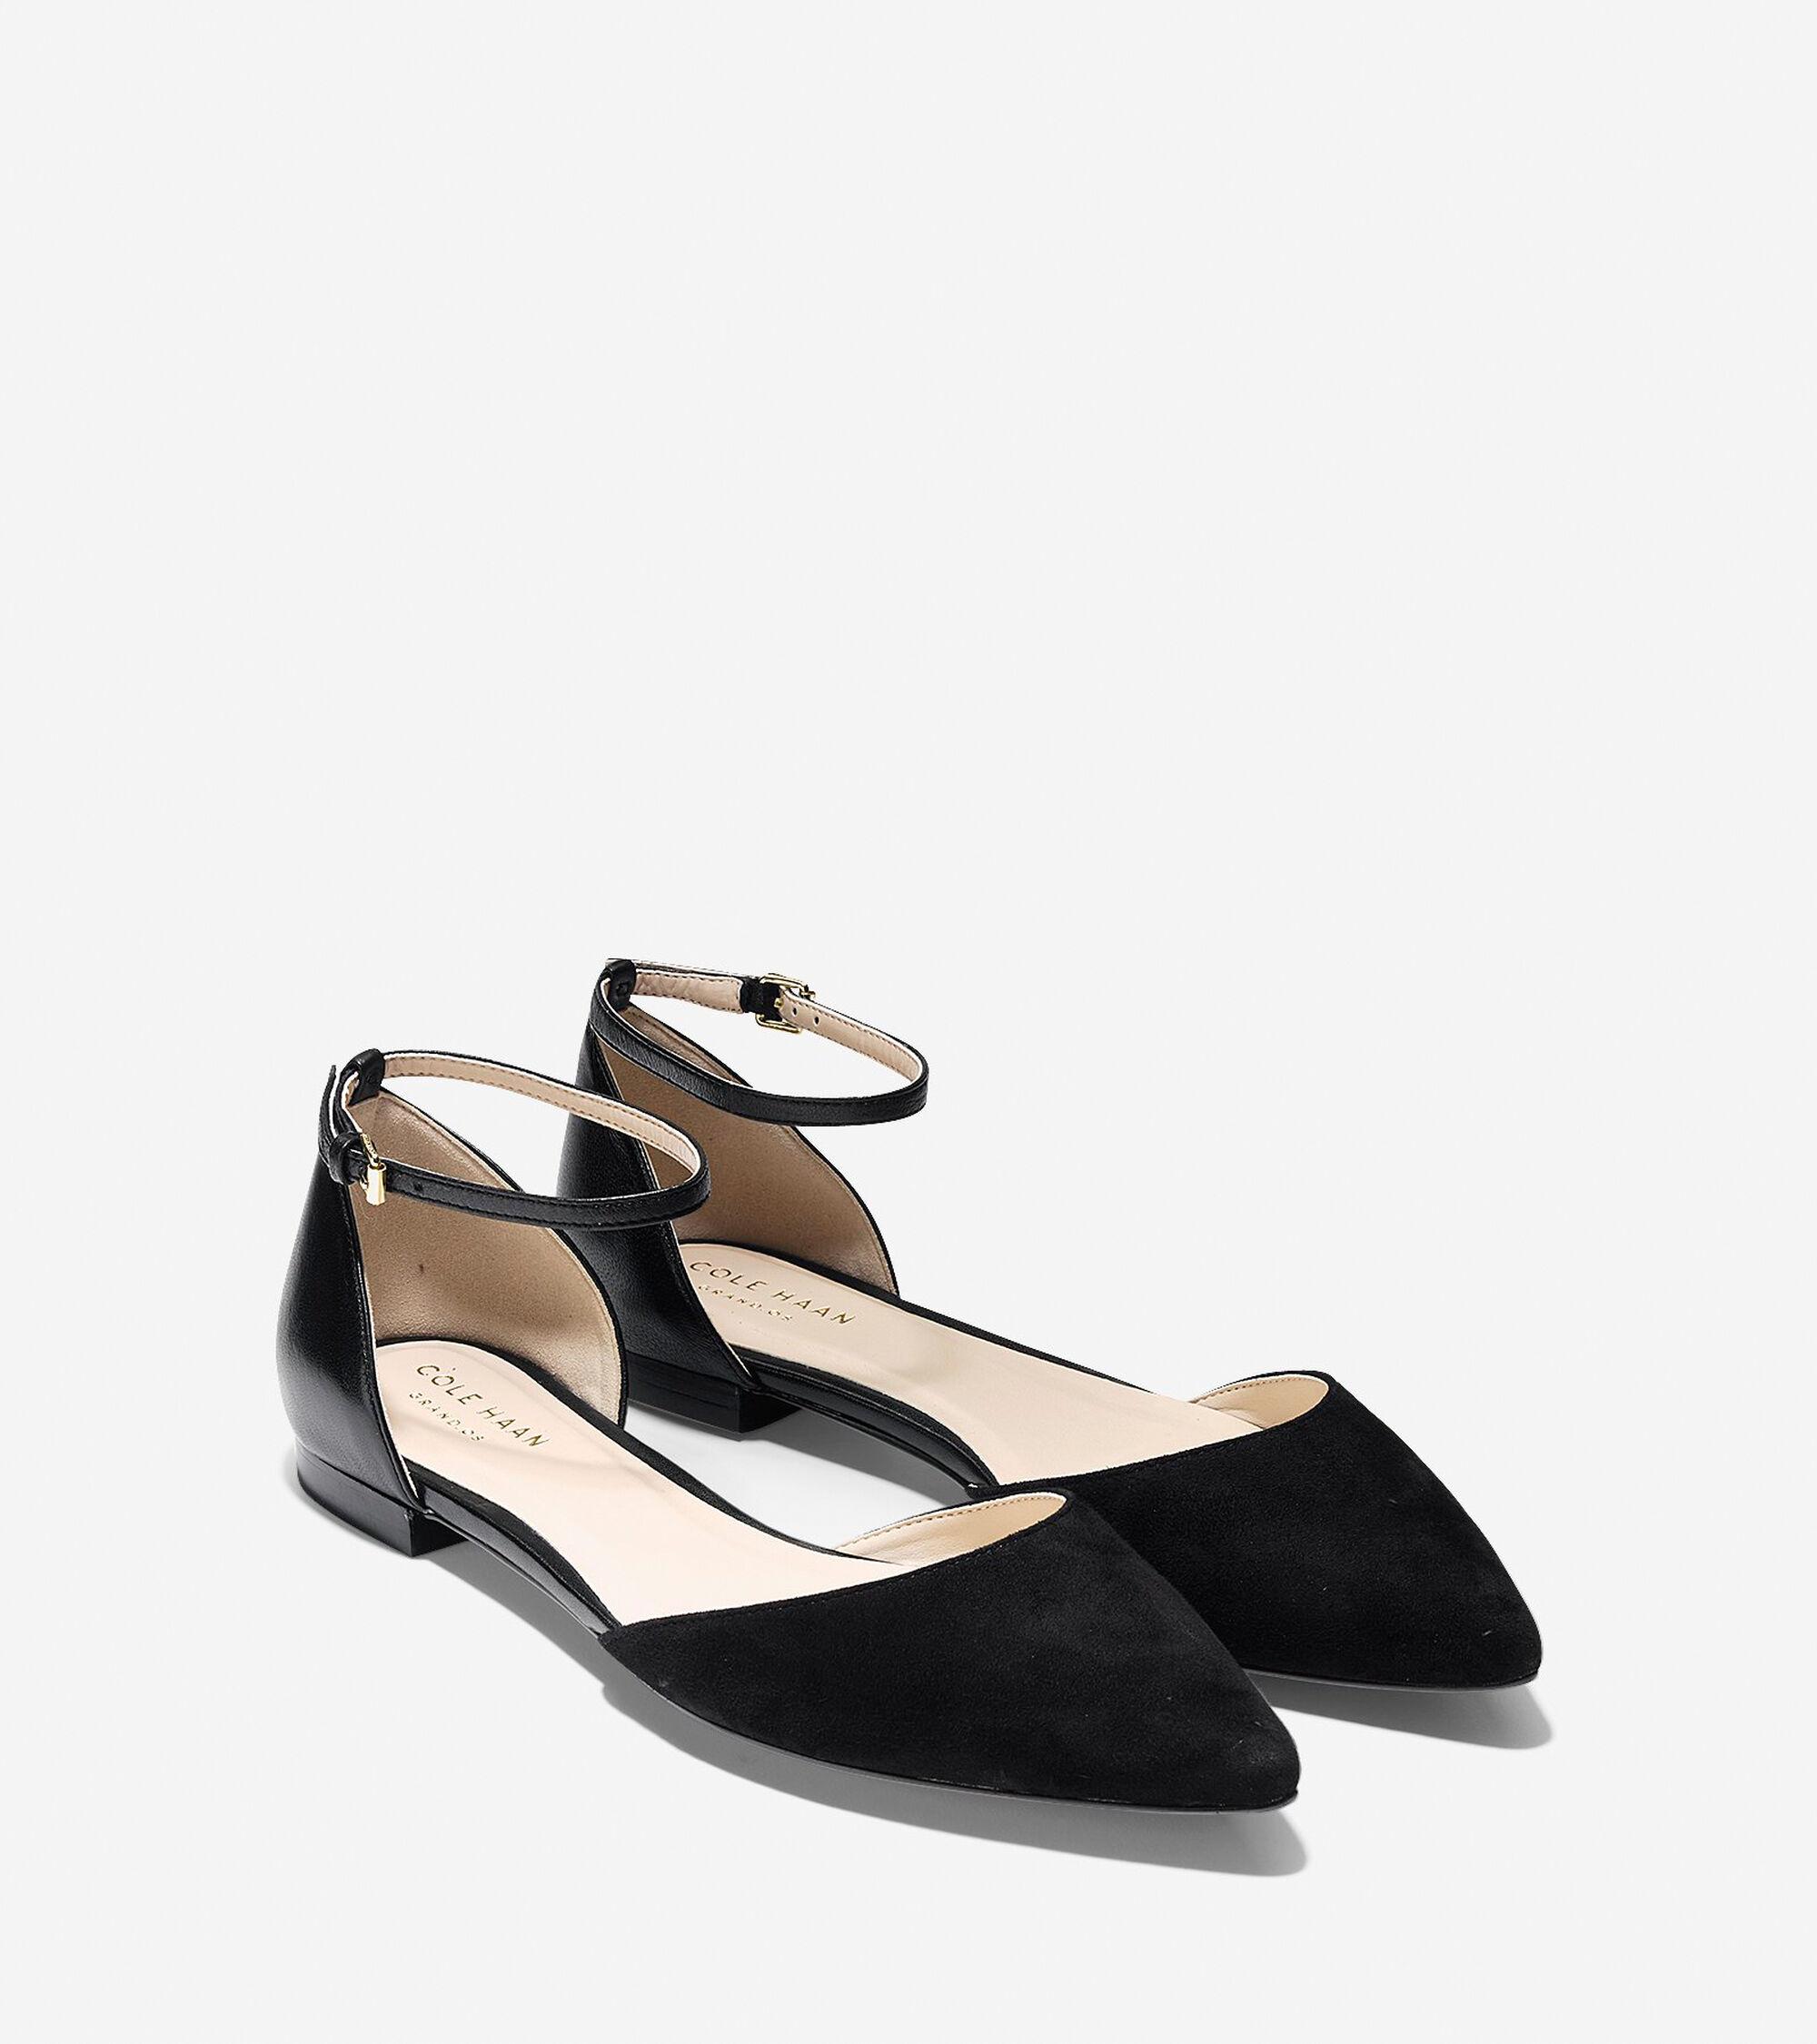 27513eeee046 Women s Abigail Grand Skimmers Flats in Black